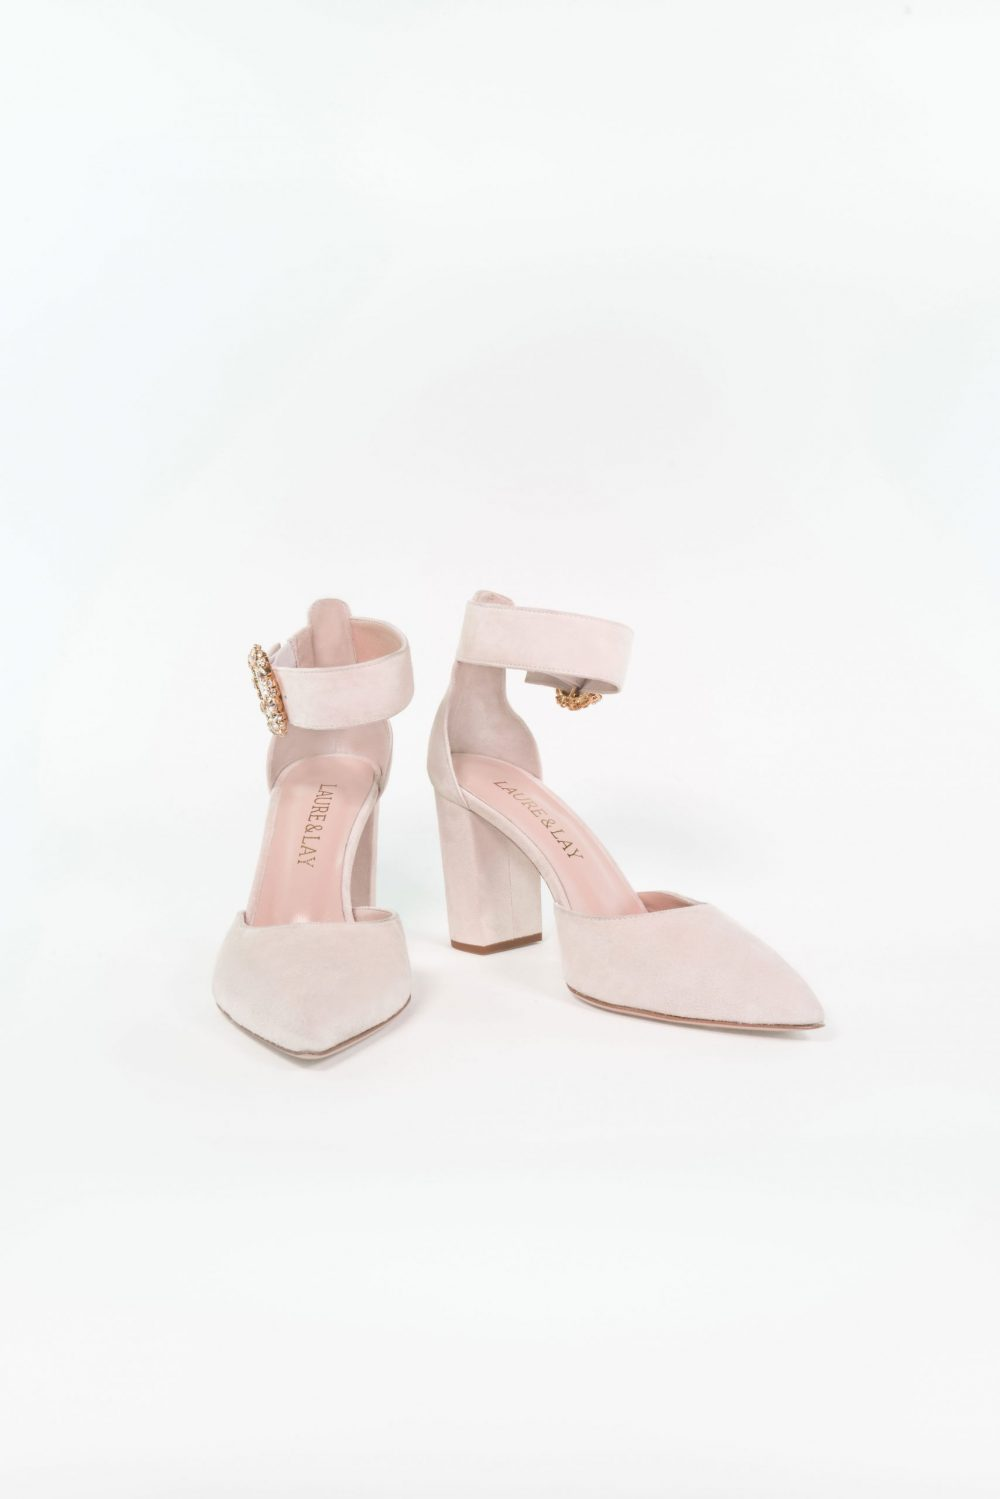 Brautschuh Noemi Light Rose mit Ankle Strap